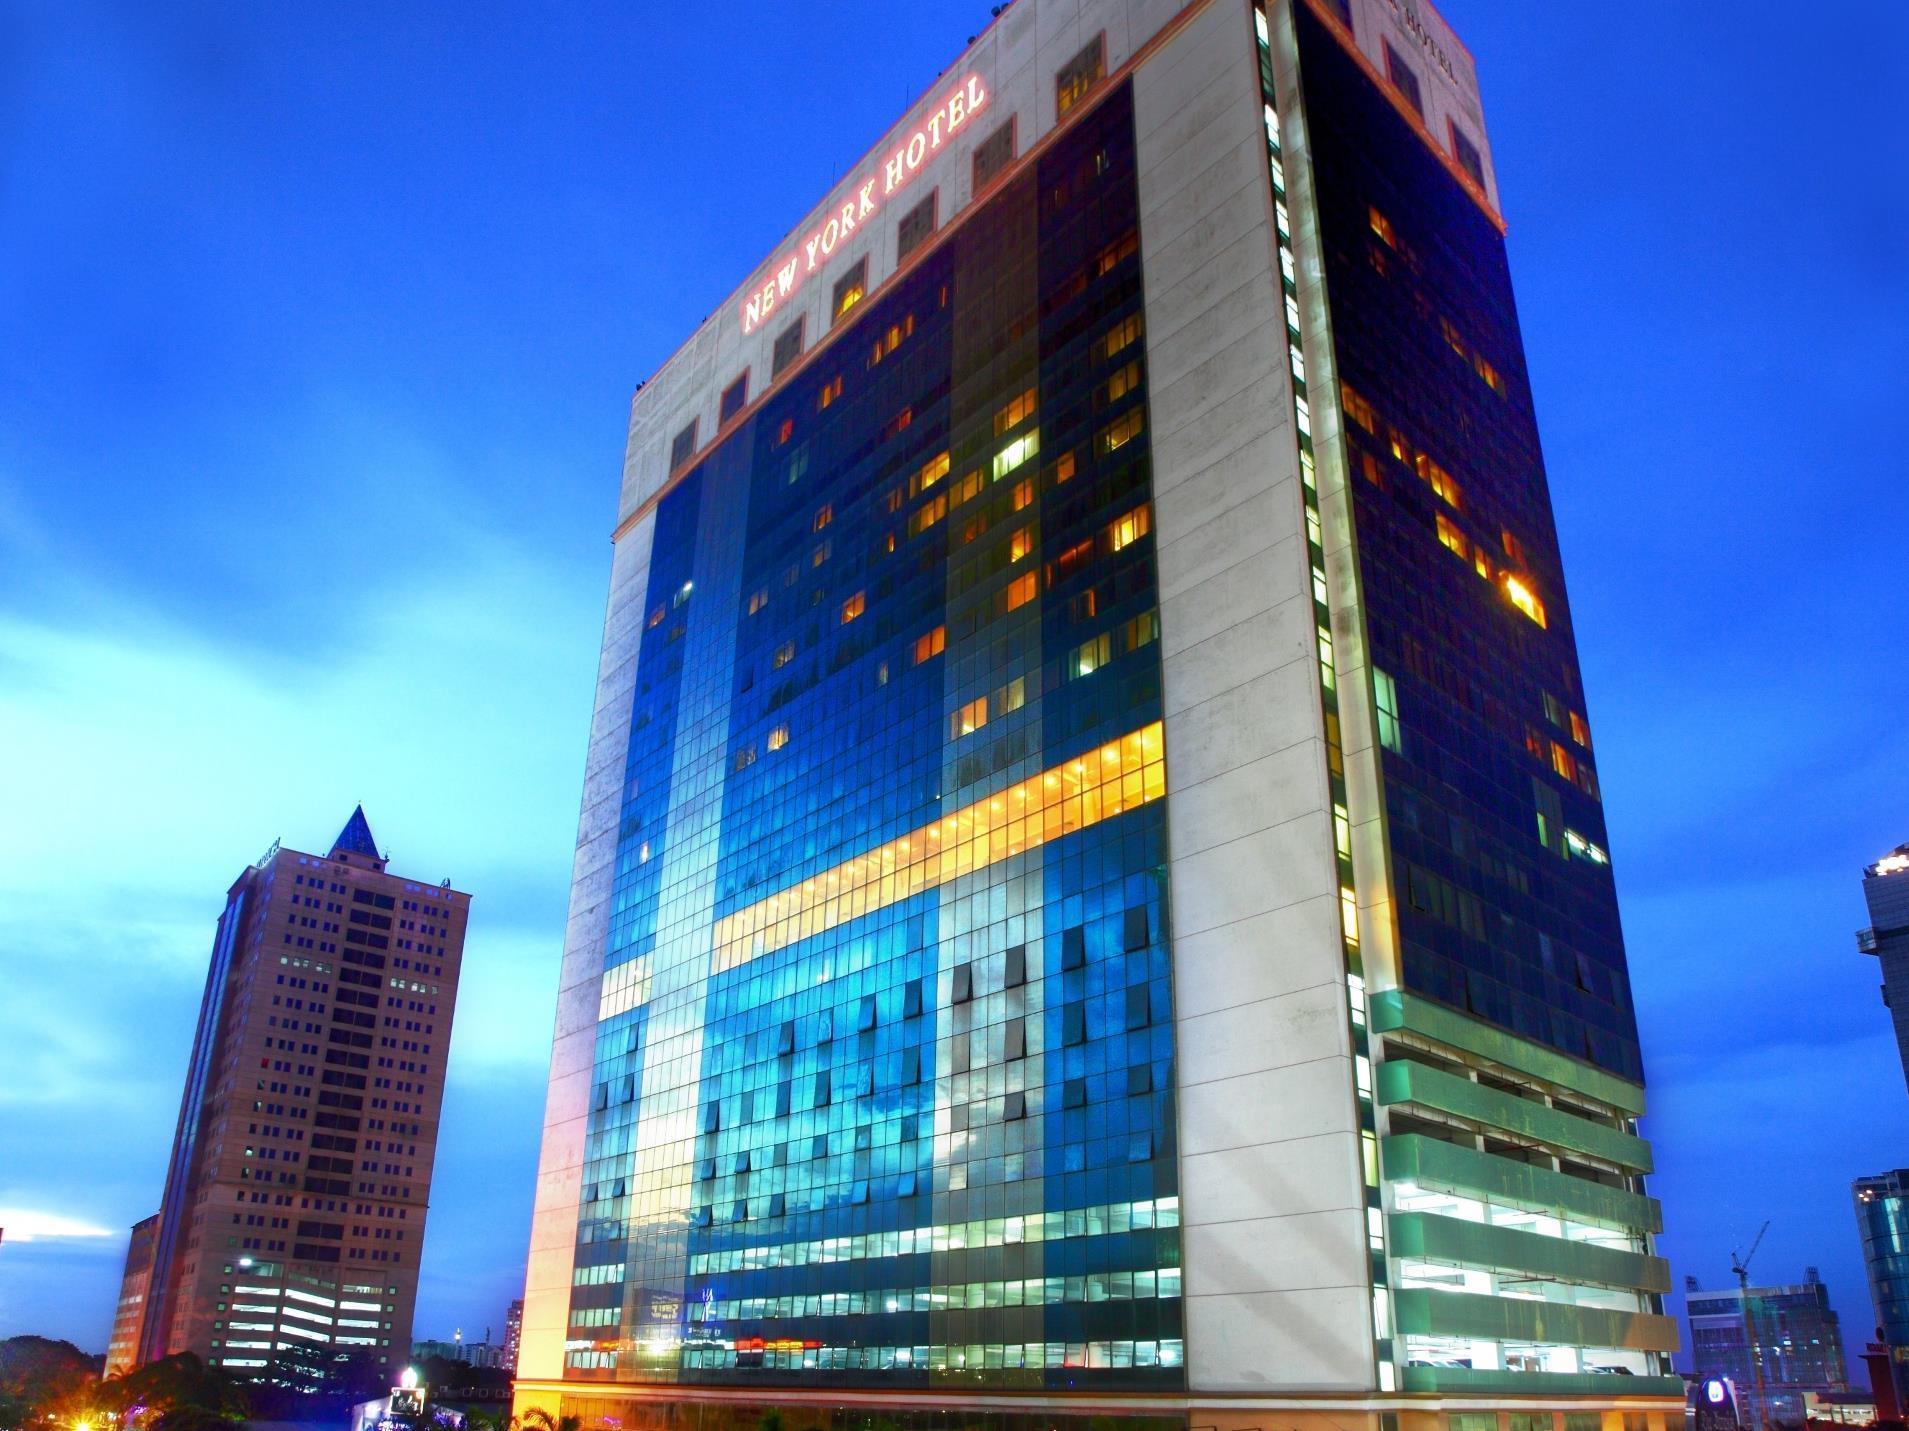 New York Hotel, Johor Bahru